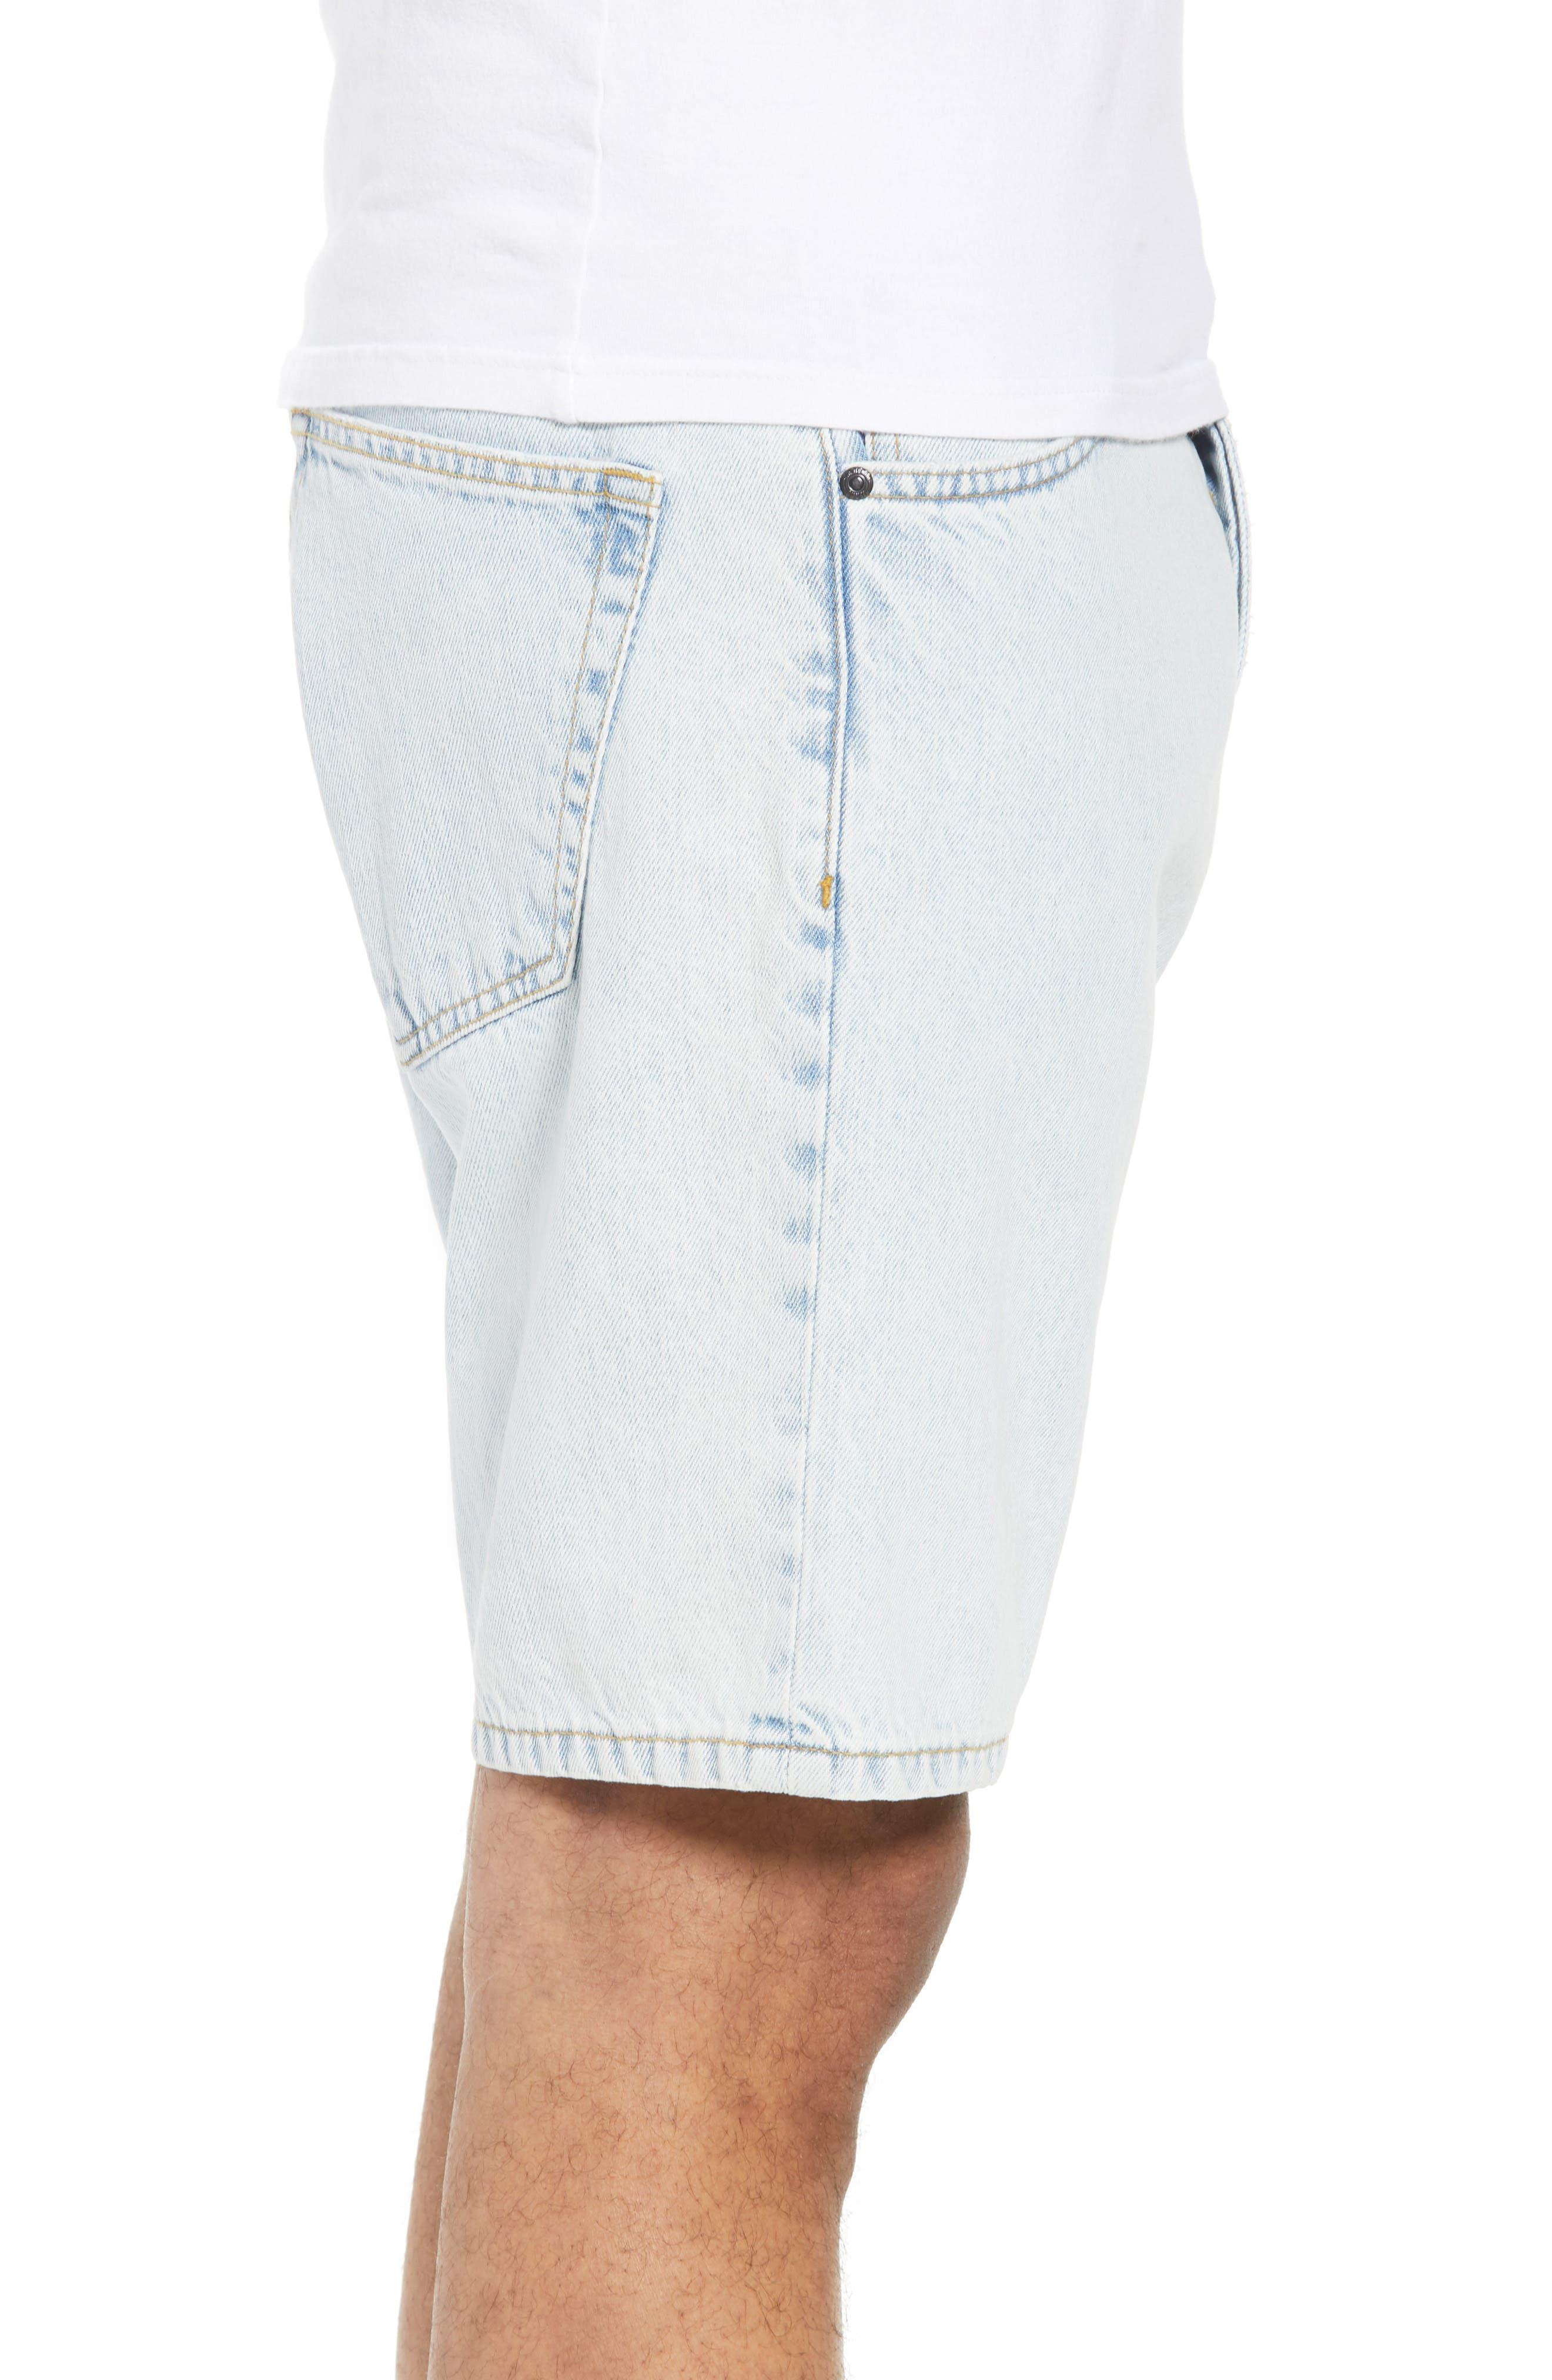 Dr. Denim Jeansmaker Bay Denim Shorts,                             Alternate thumbnail 3, color,                             WORN SUPERLIGHT BLUE